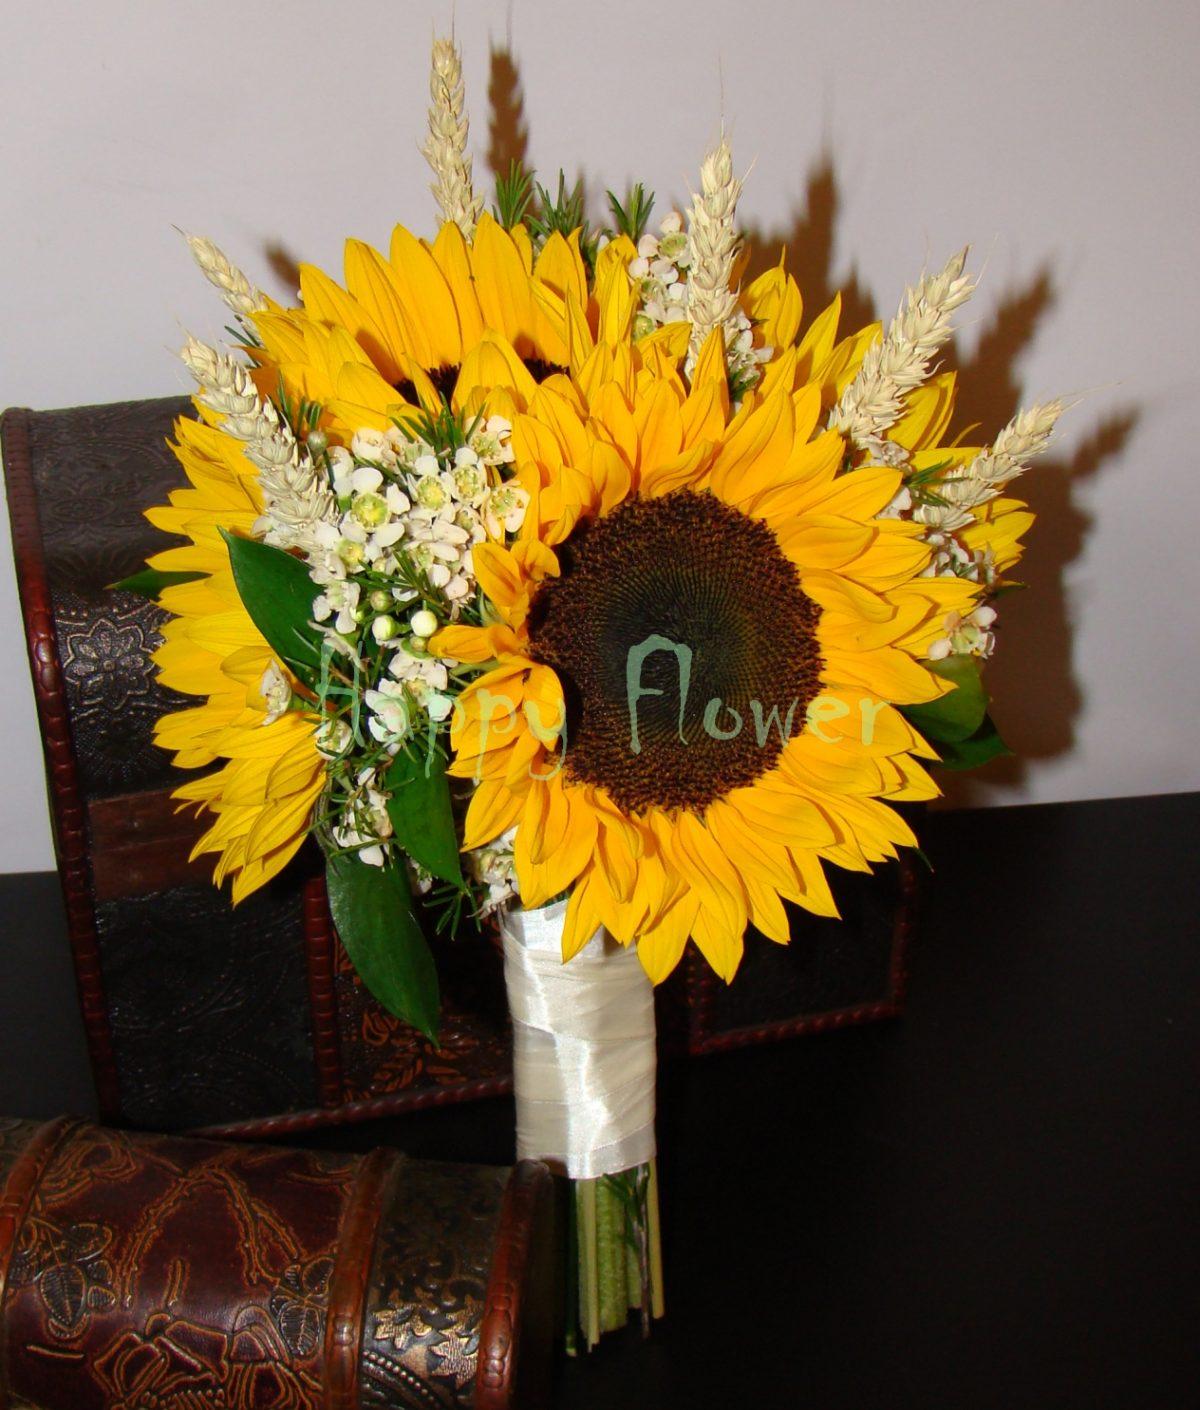 Buchet mireasa floarea soarelui, waxflower, spice de grau